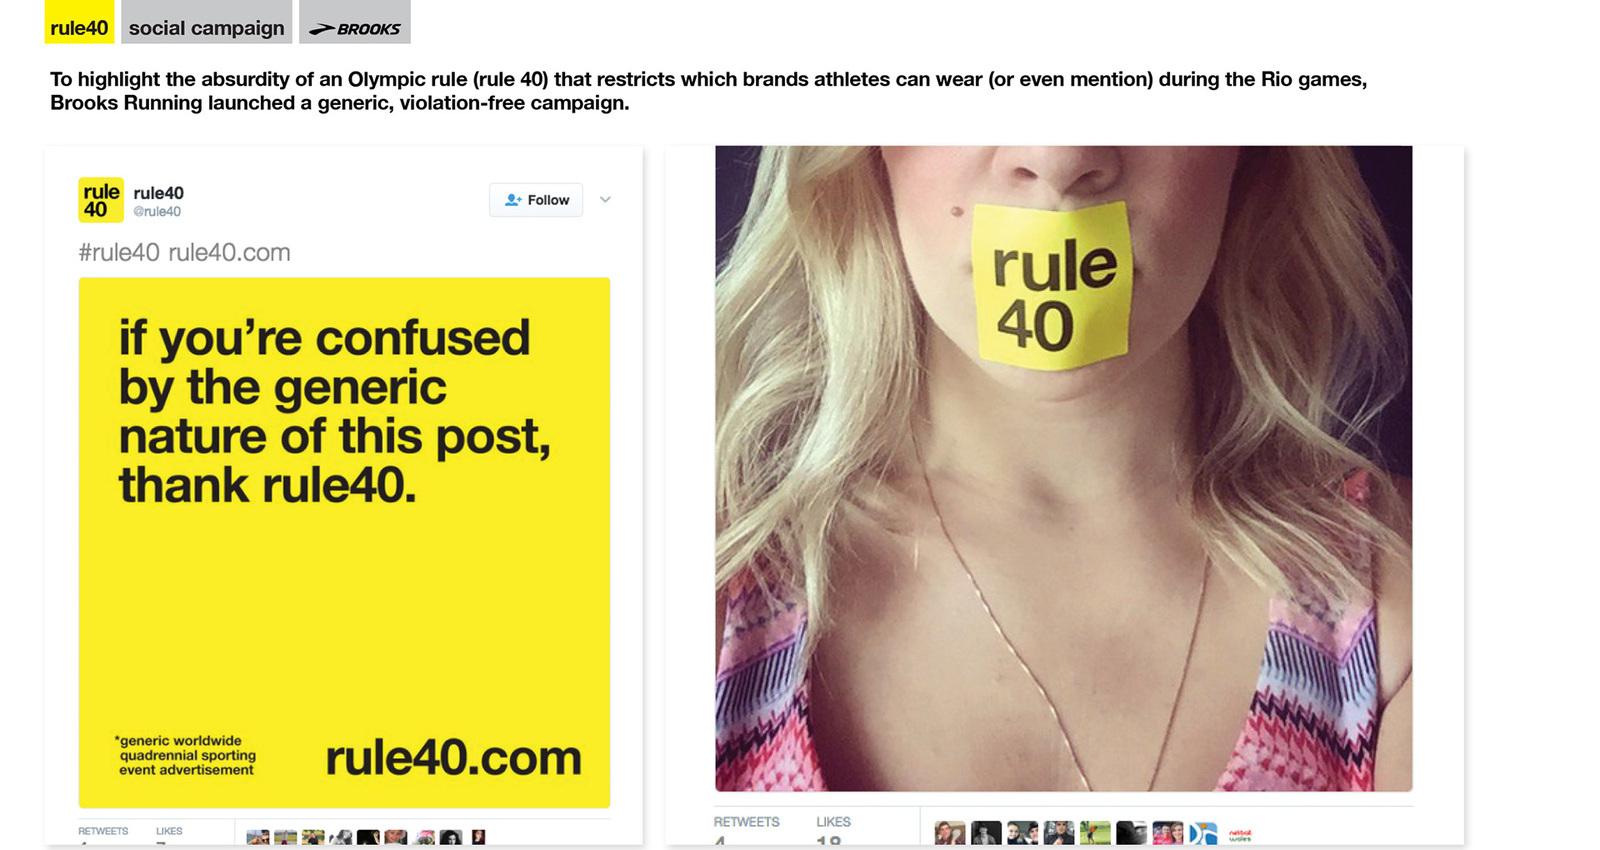 Rule40